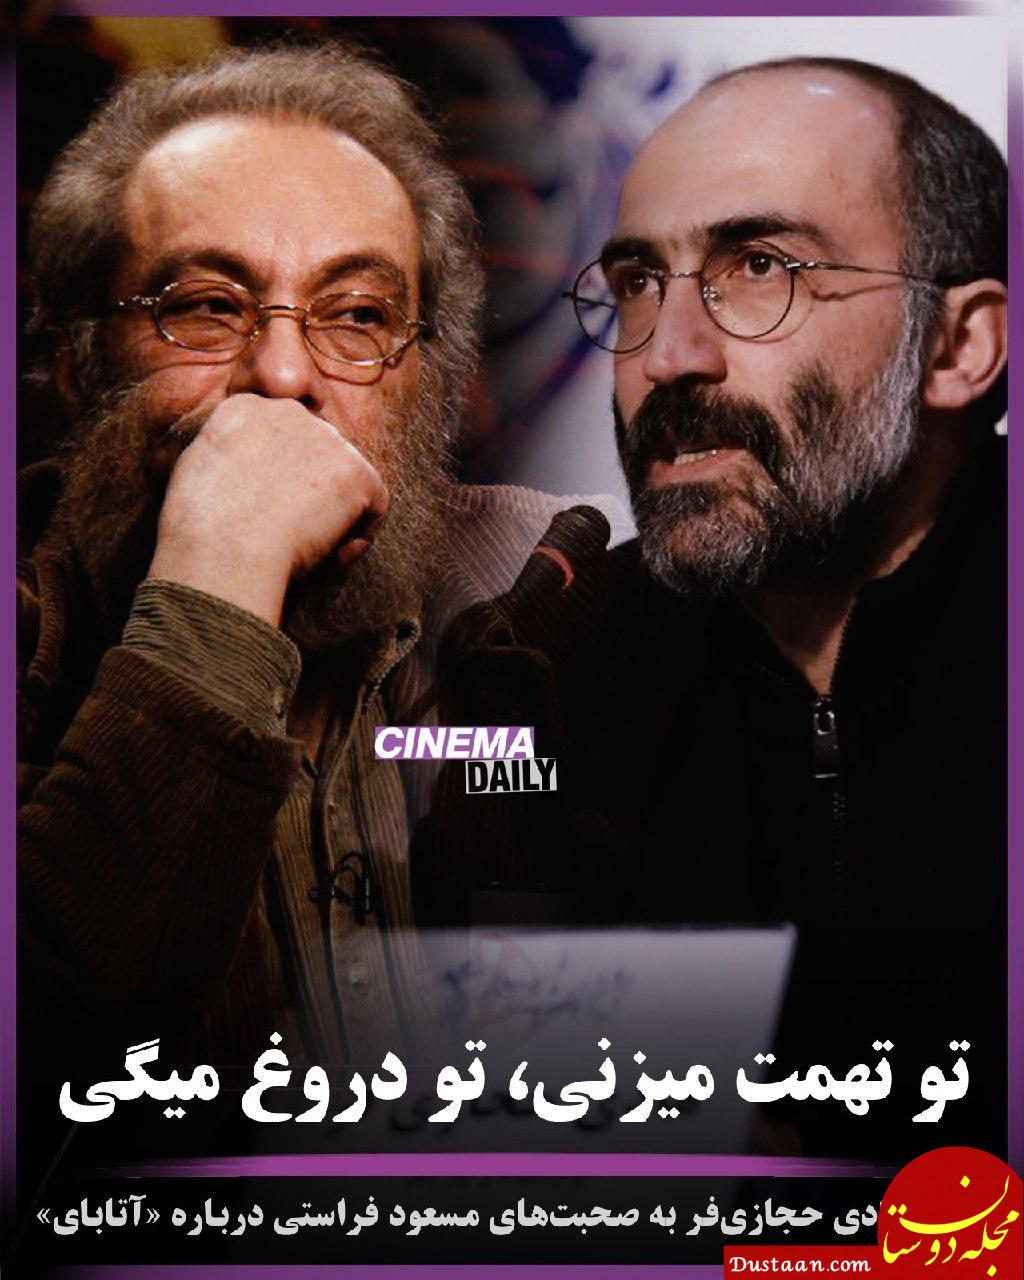 www.dustaan.com پاسخ هادی حجازی فر به مسعود فراستی: تو تهمت میزنی، تو دروغ میگی